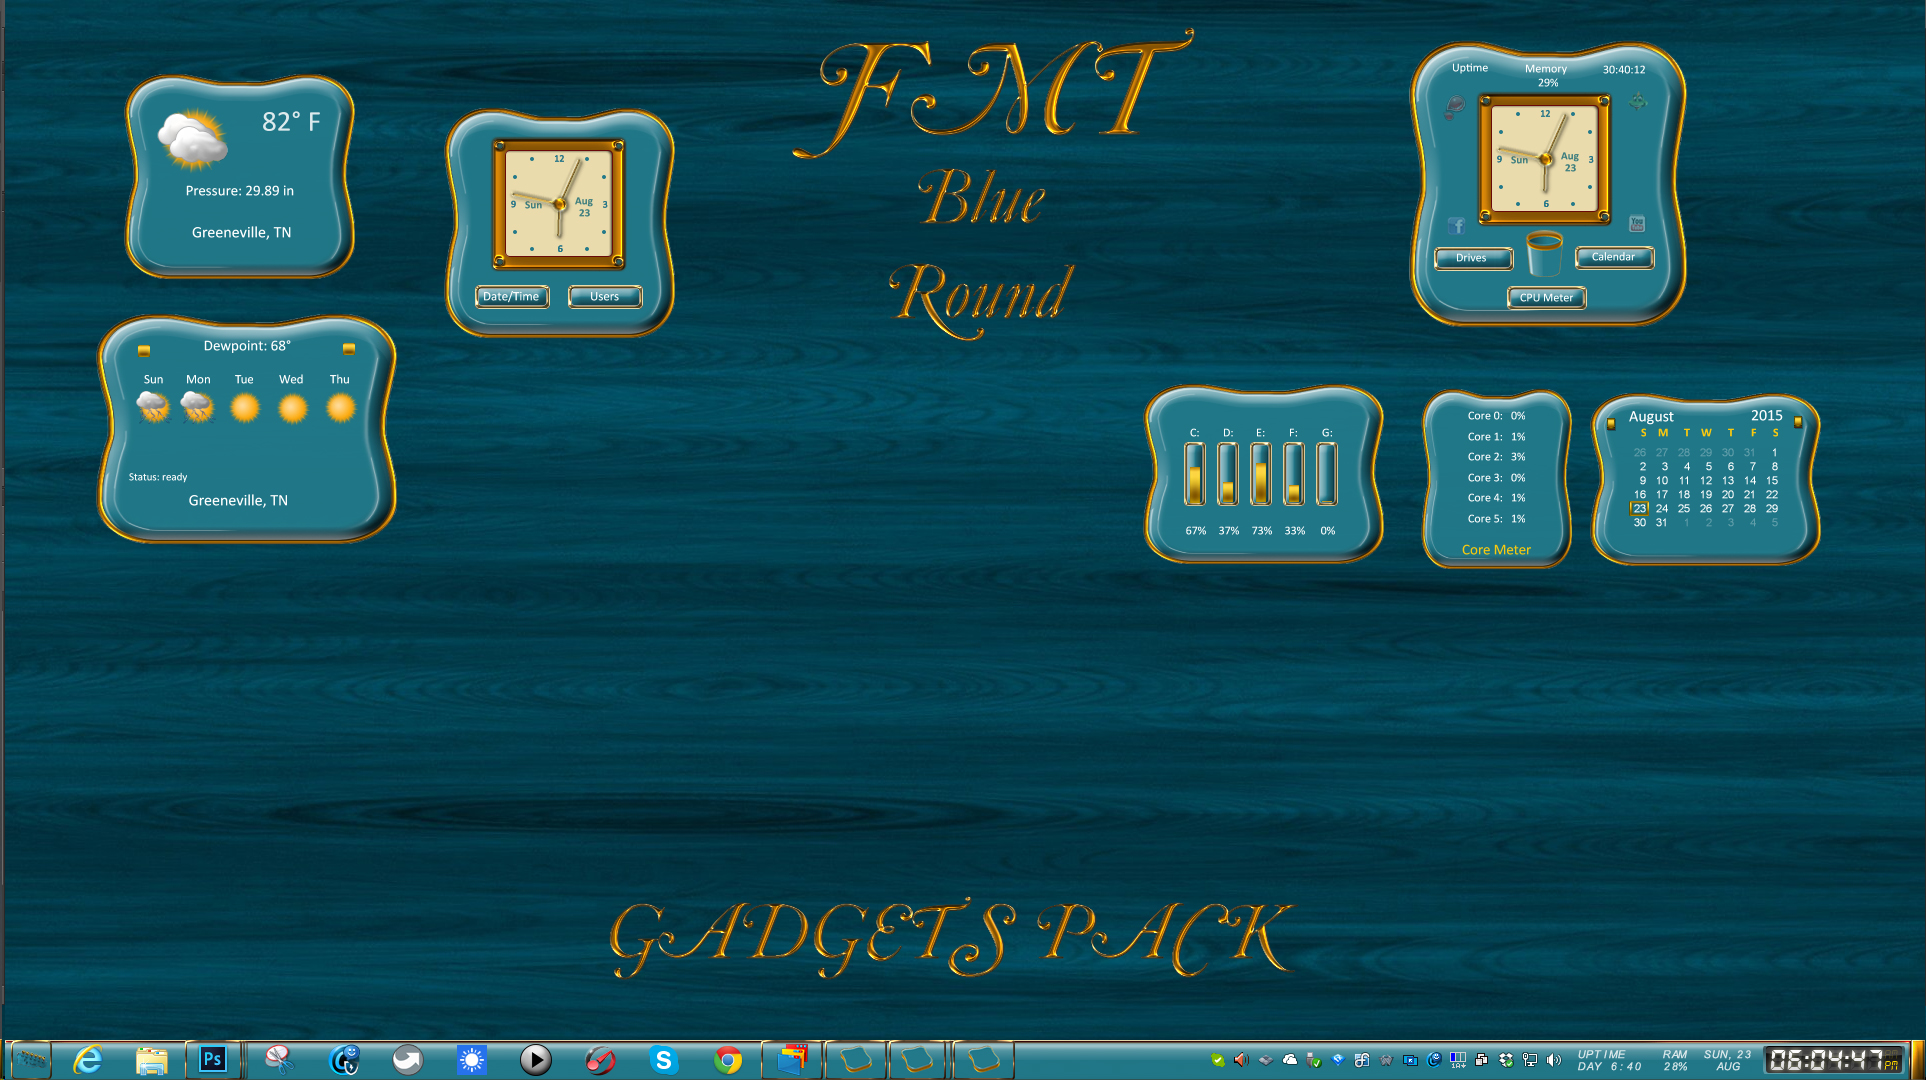 FMT Blue Round Gadget Pack